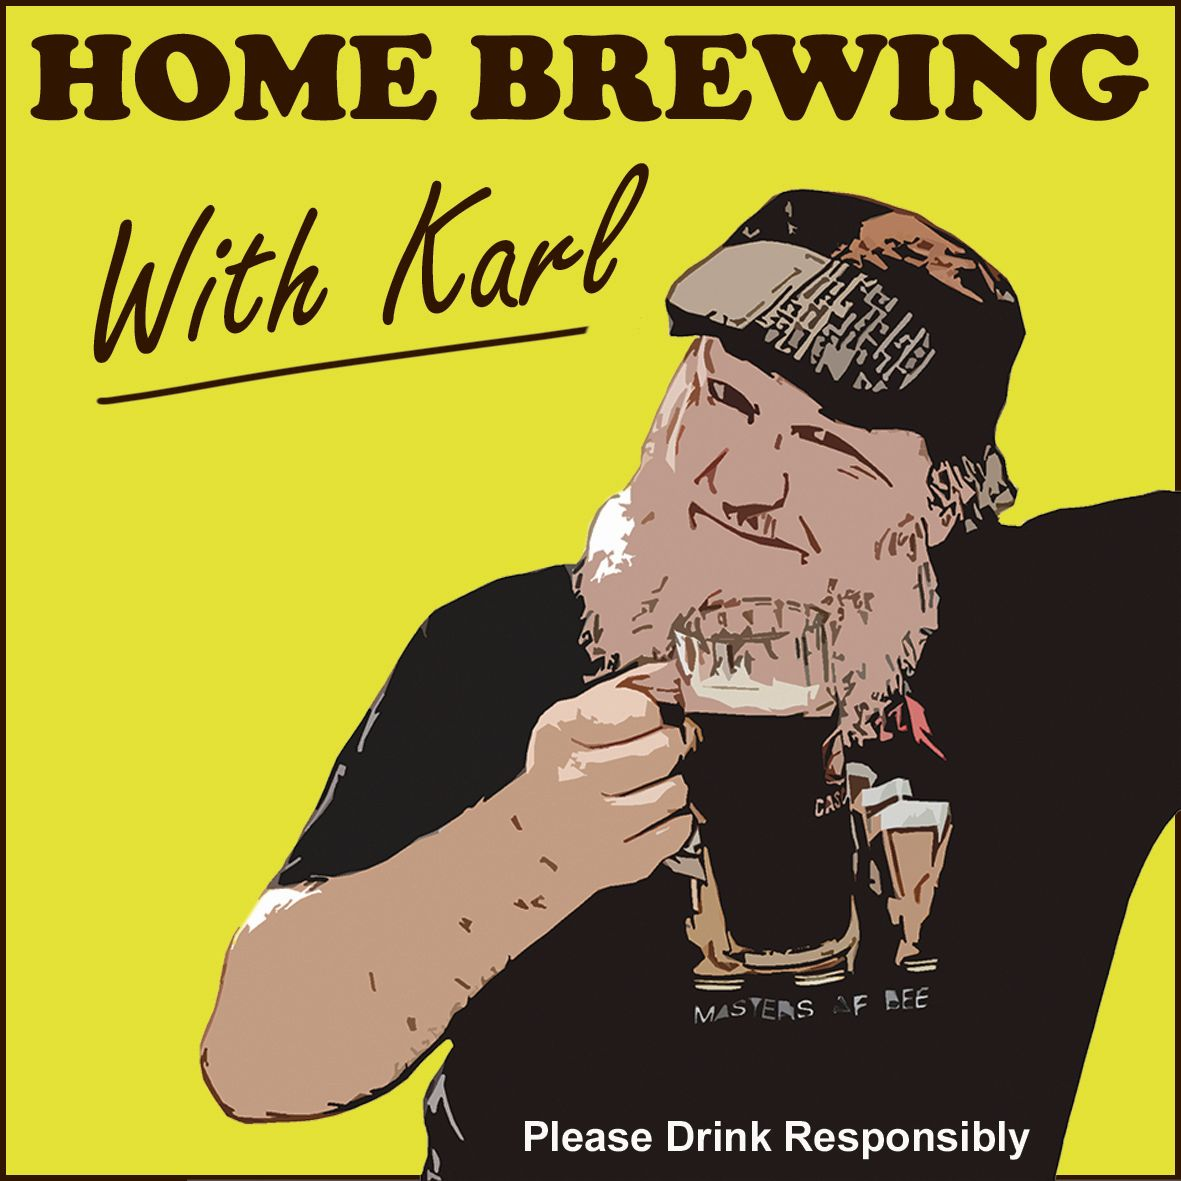 homebrewing_withkarl_logo.jpg